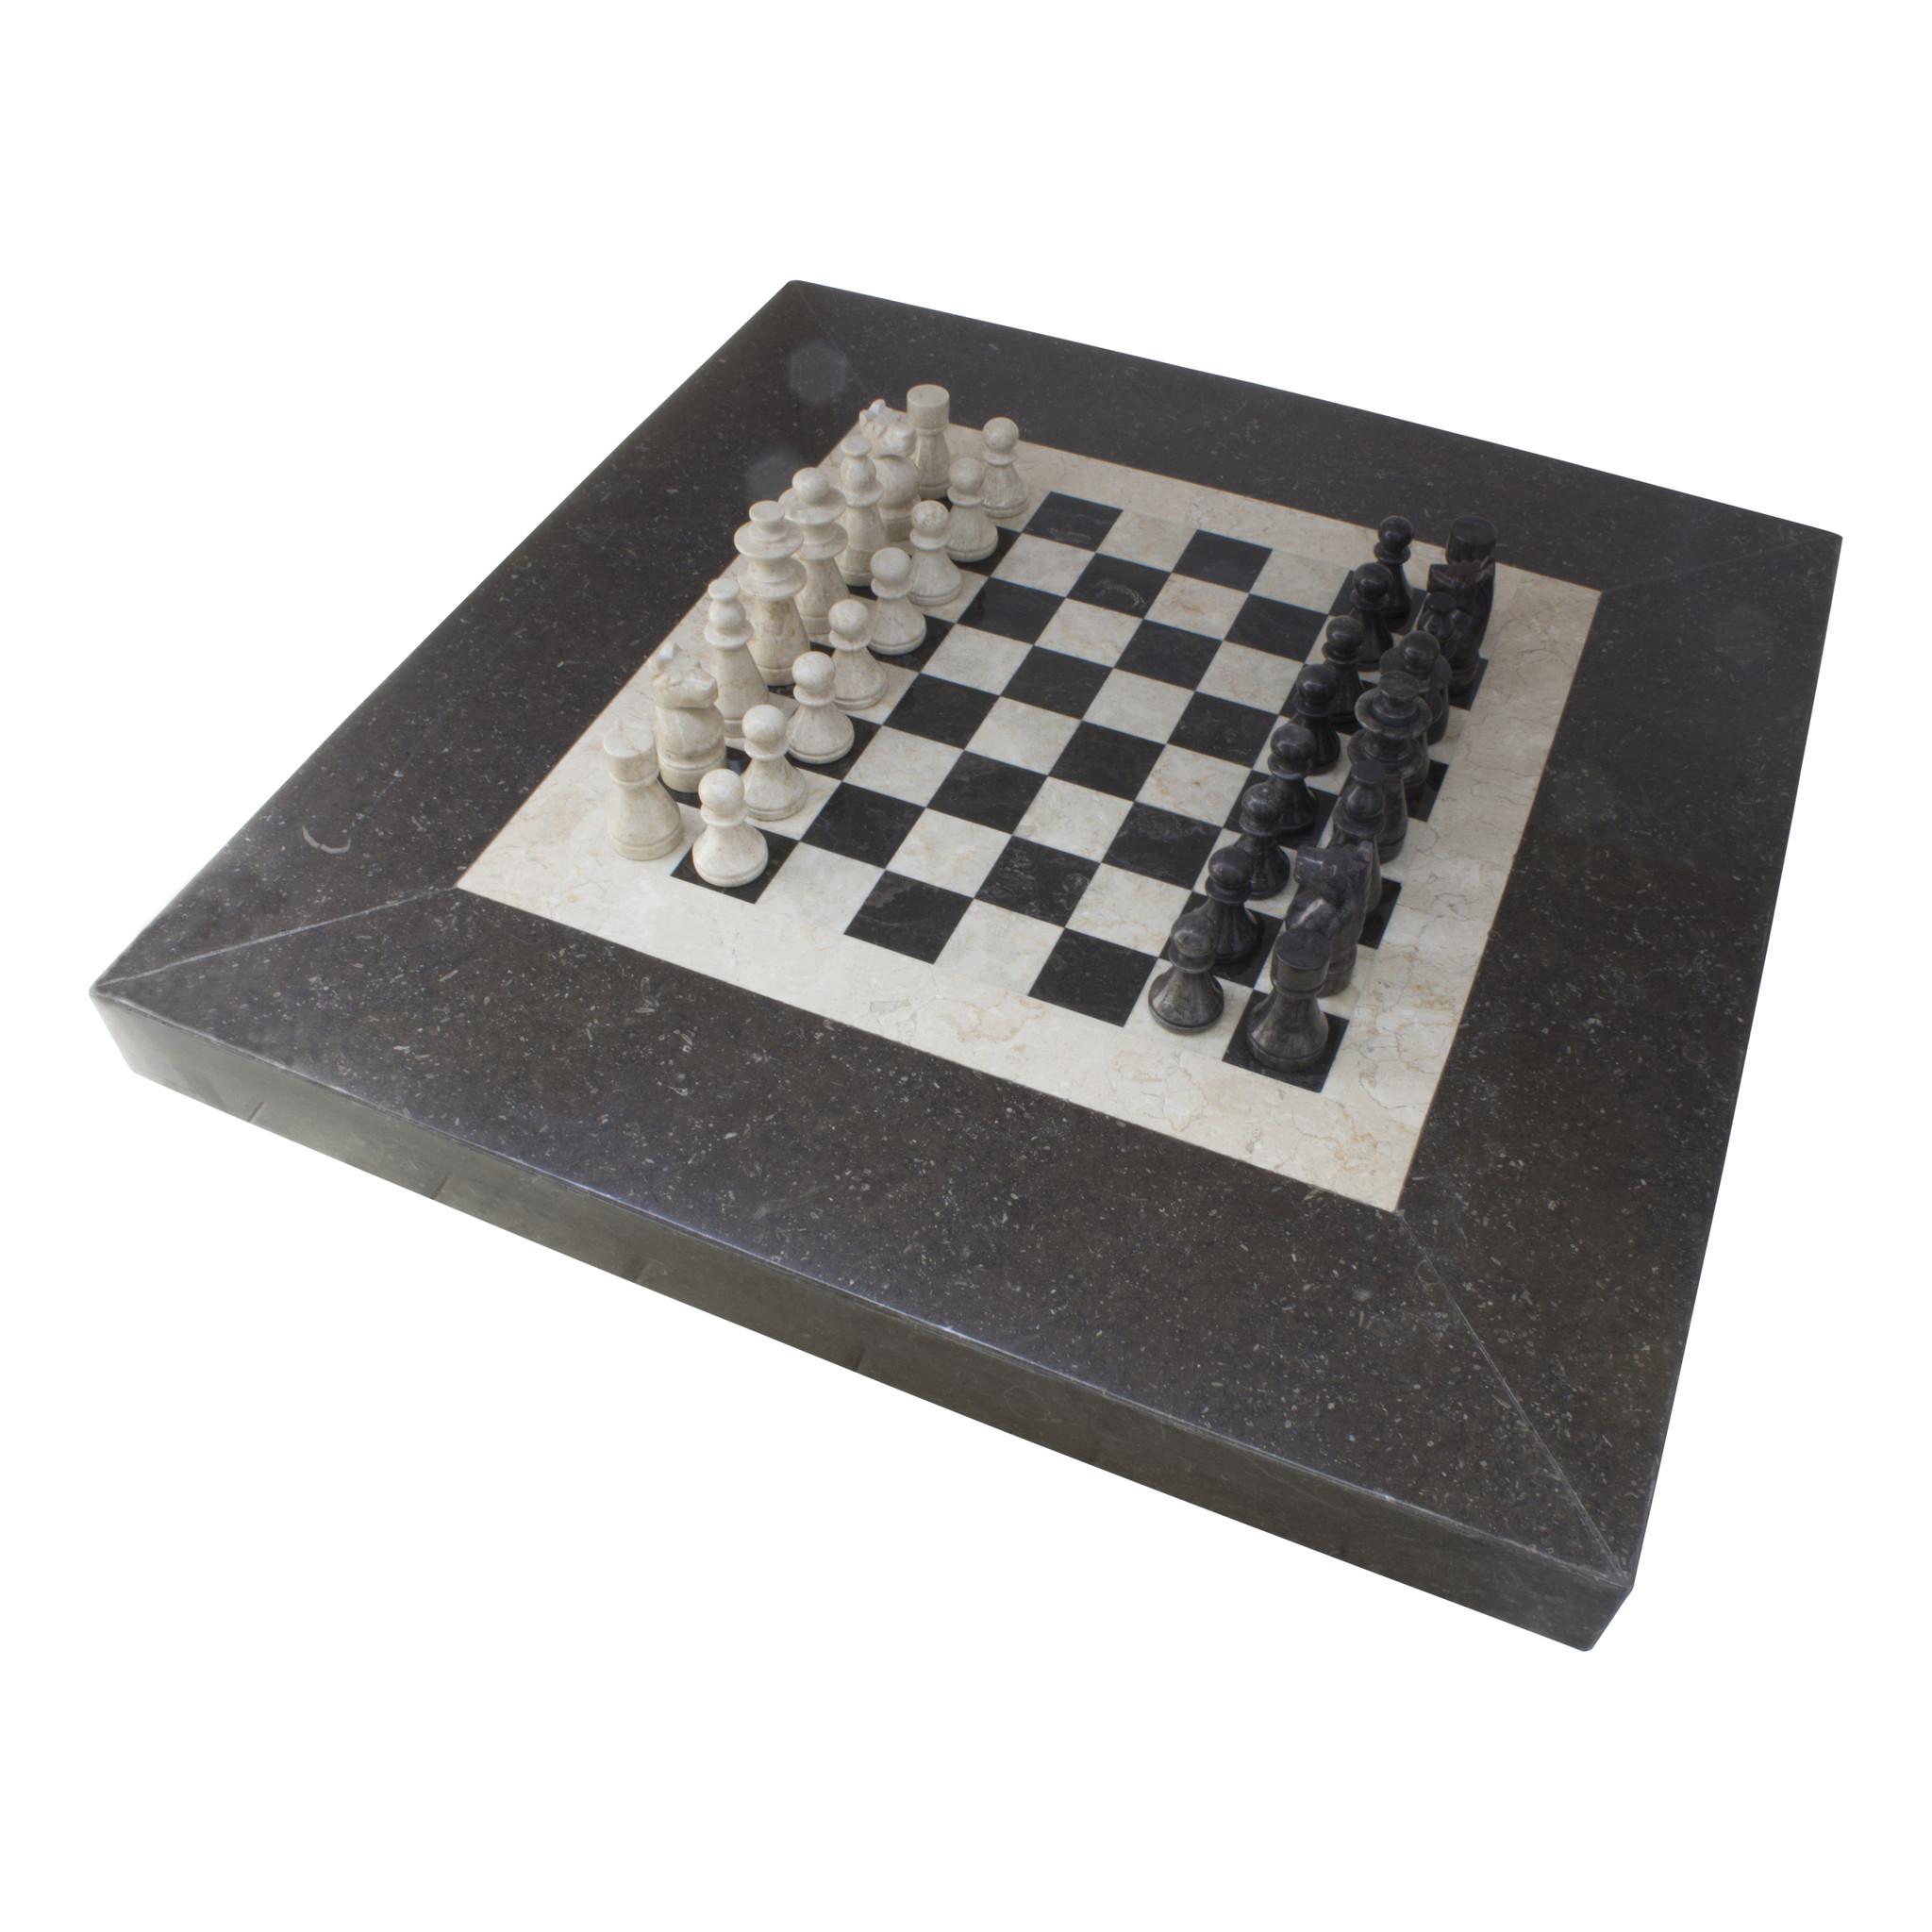 Indomarmer Schachtisch Quadrat 80x80x45 cm Schwarz Marmor